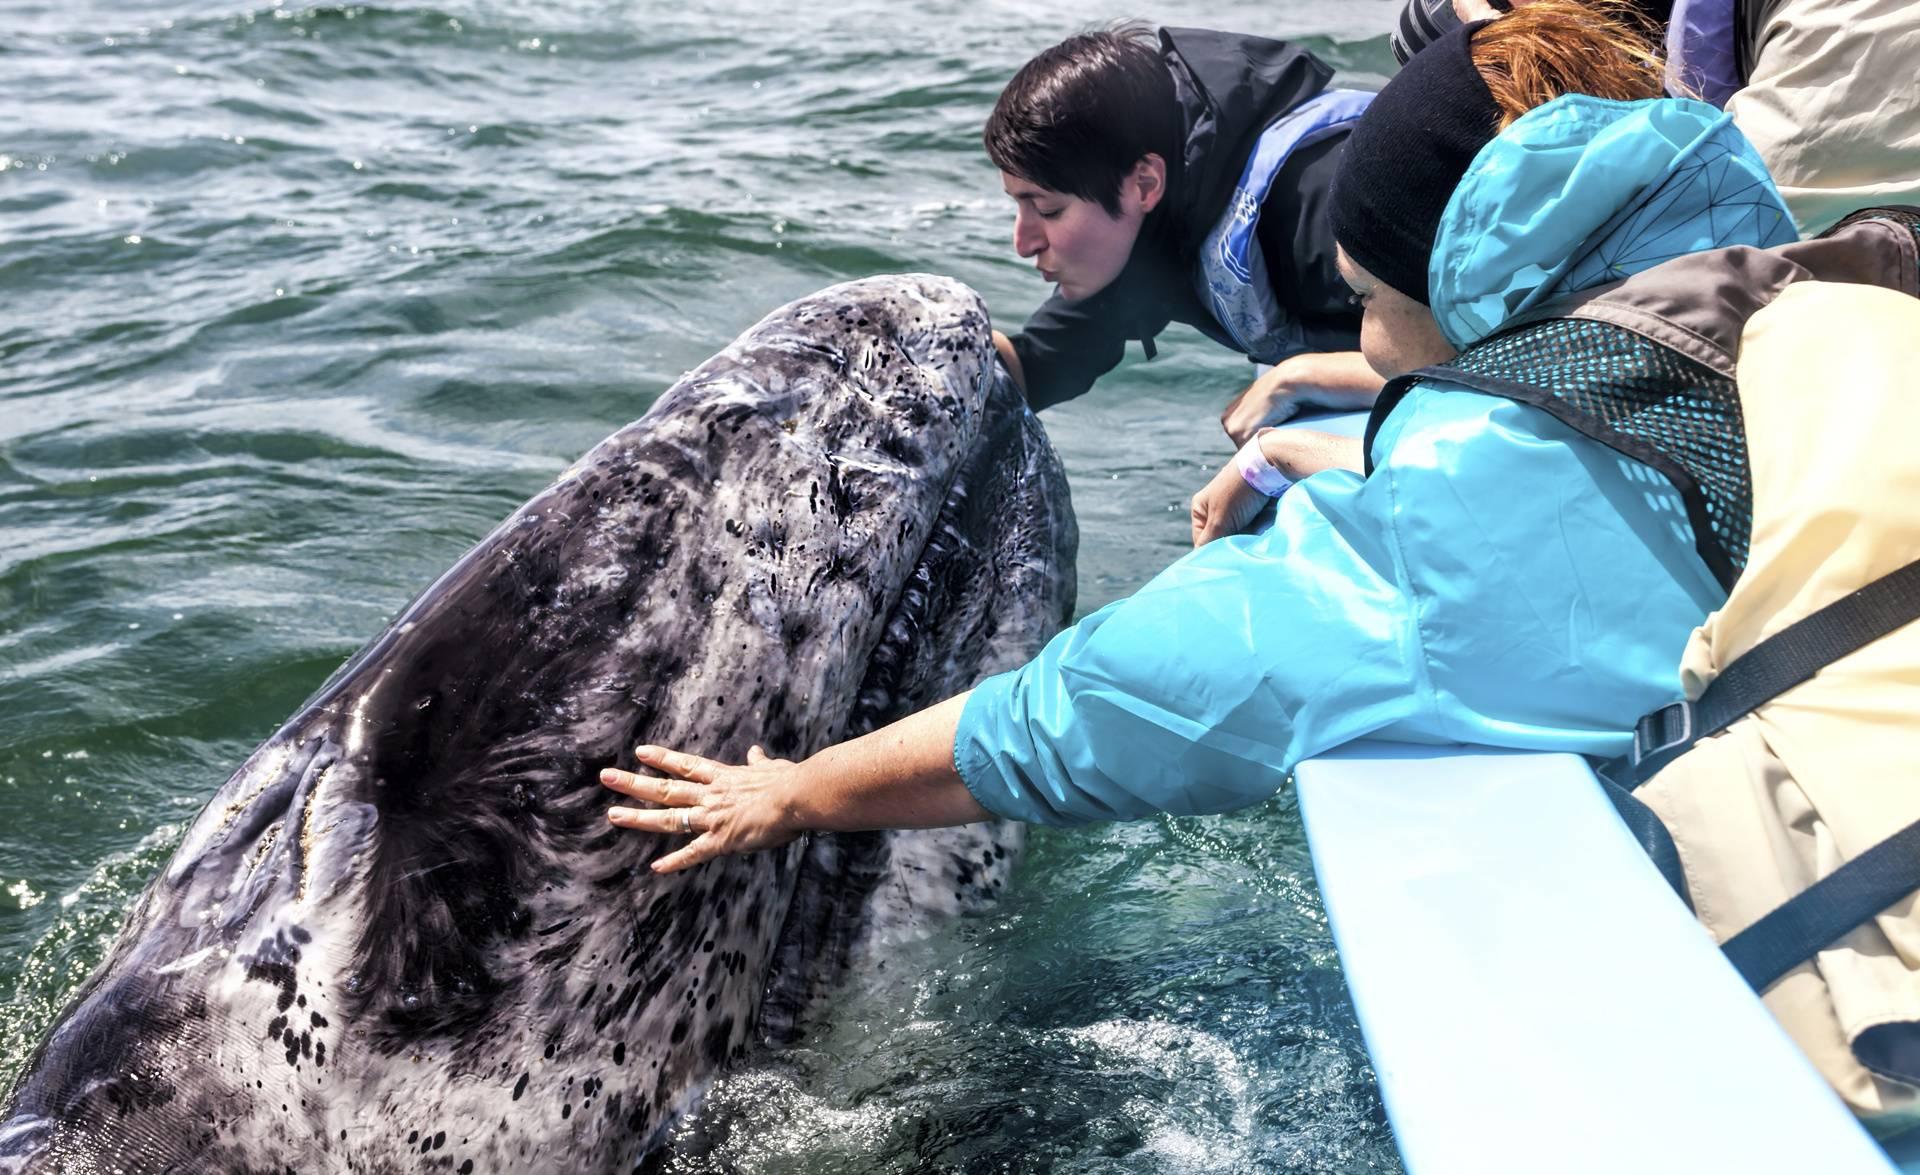 4-Day Baja California Whale Watching Tour